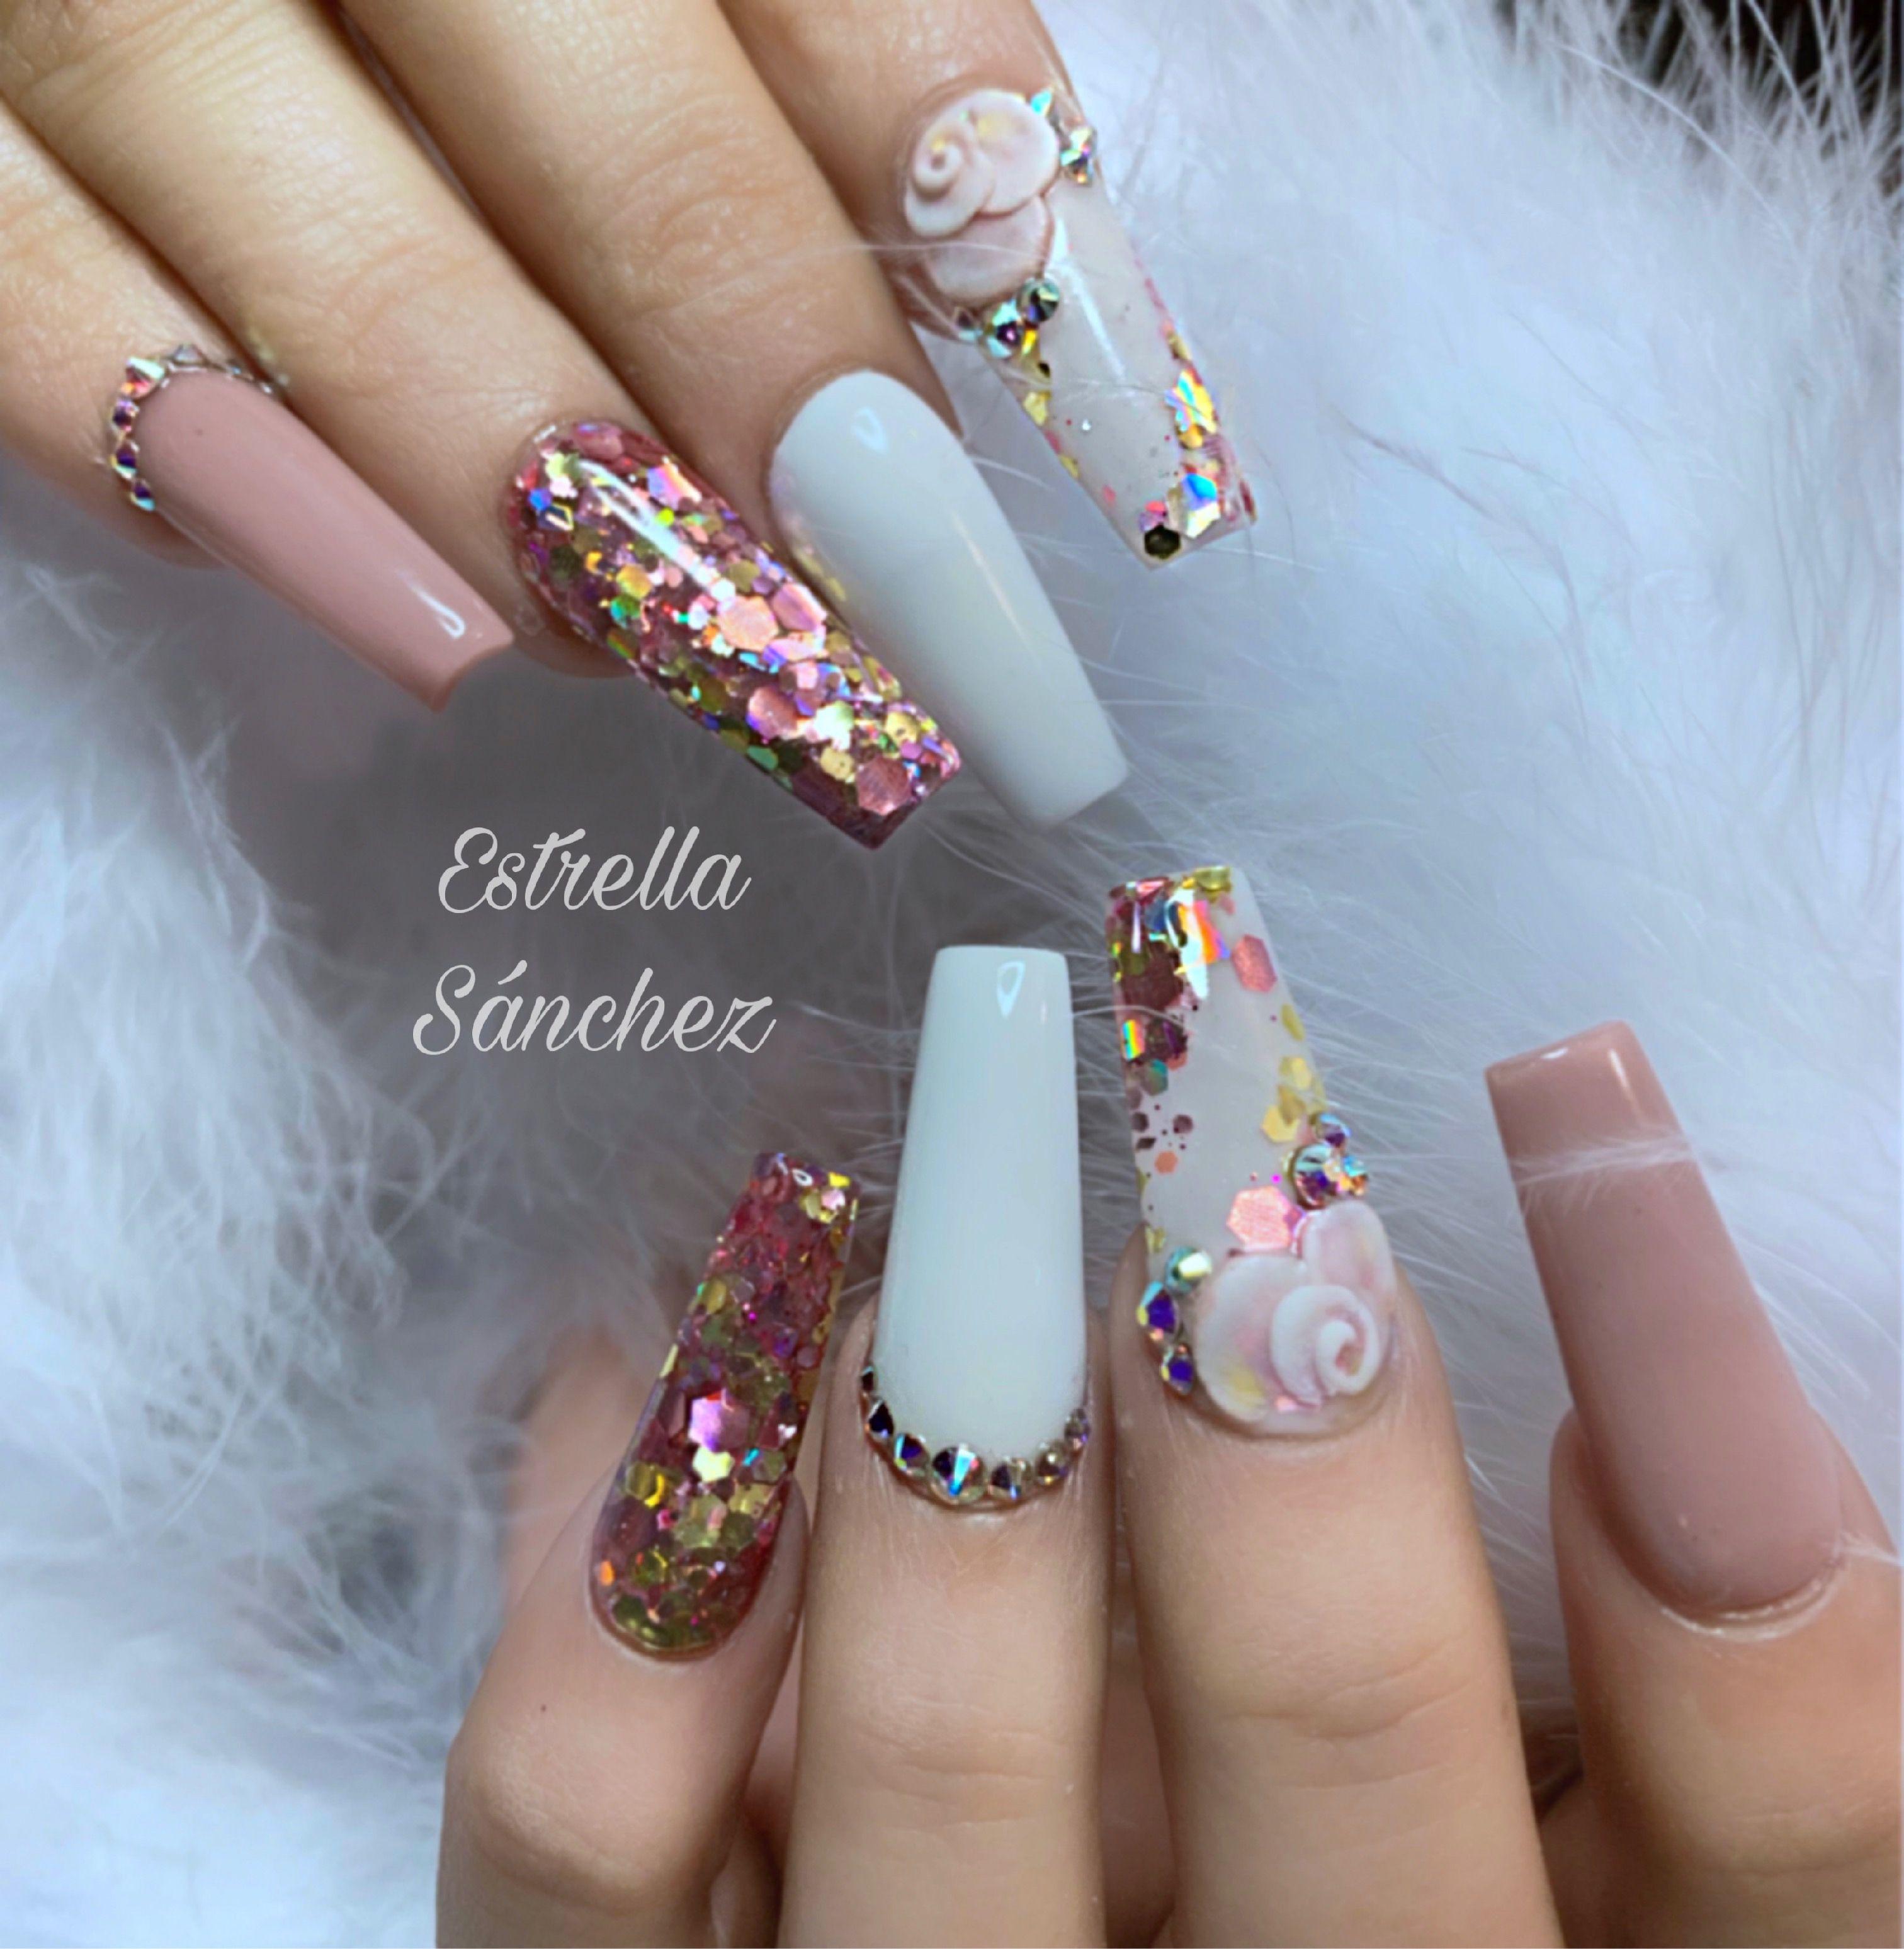 Nails Whitenails Glitternails Longnails 3d Nail Designs 3d Nail Art Designs Nail Art Designs